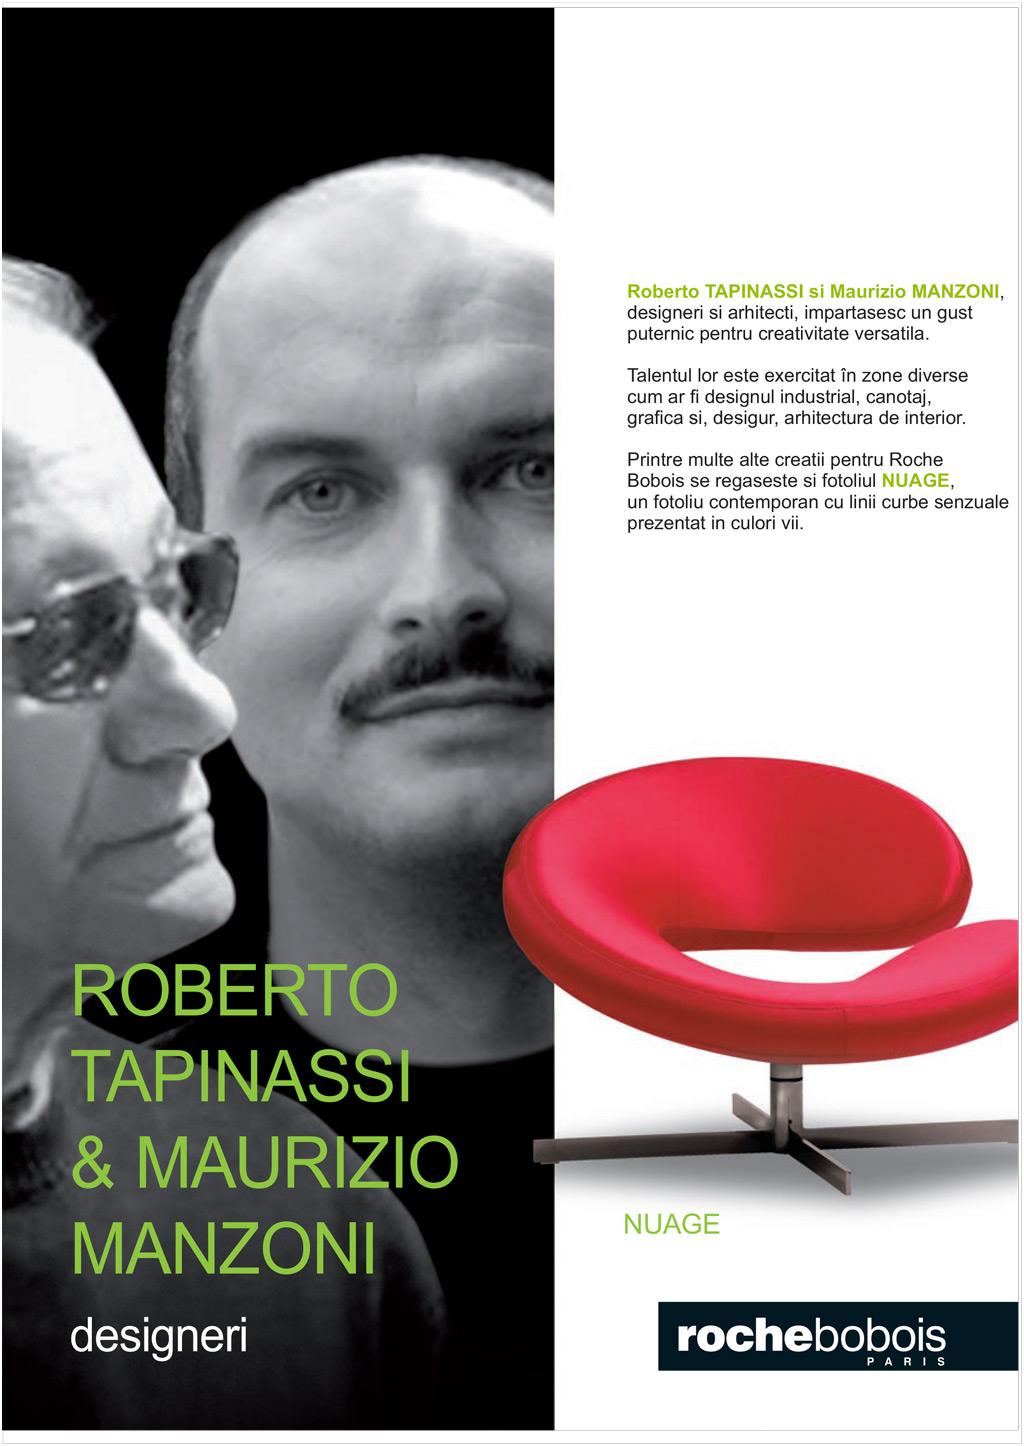 ROBERTO-TAPINASSI-&-MAURIZIO-MANZONI---NUAGE